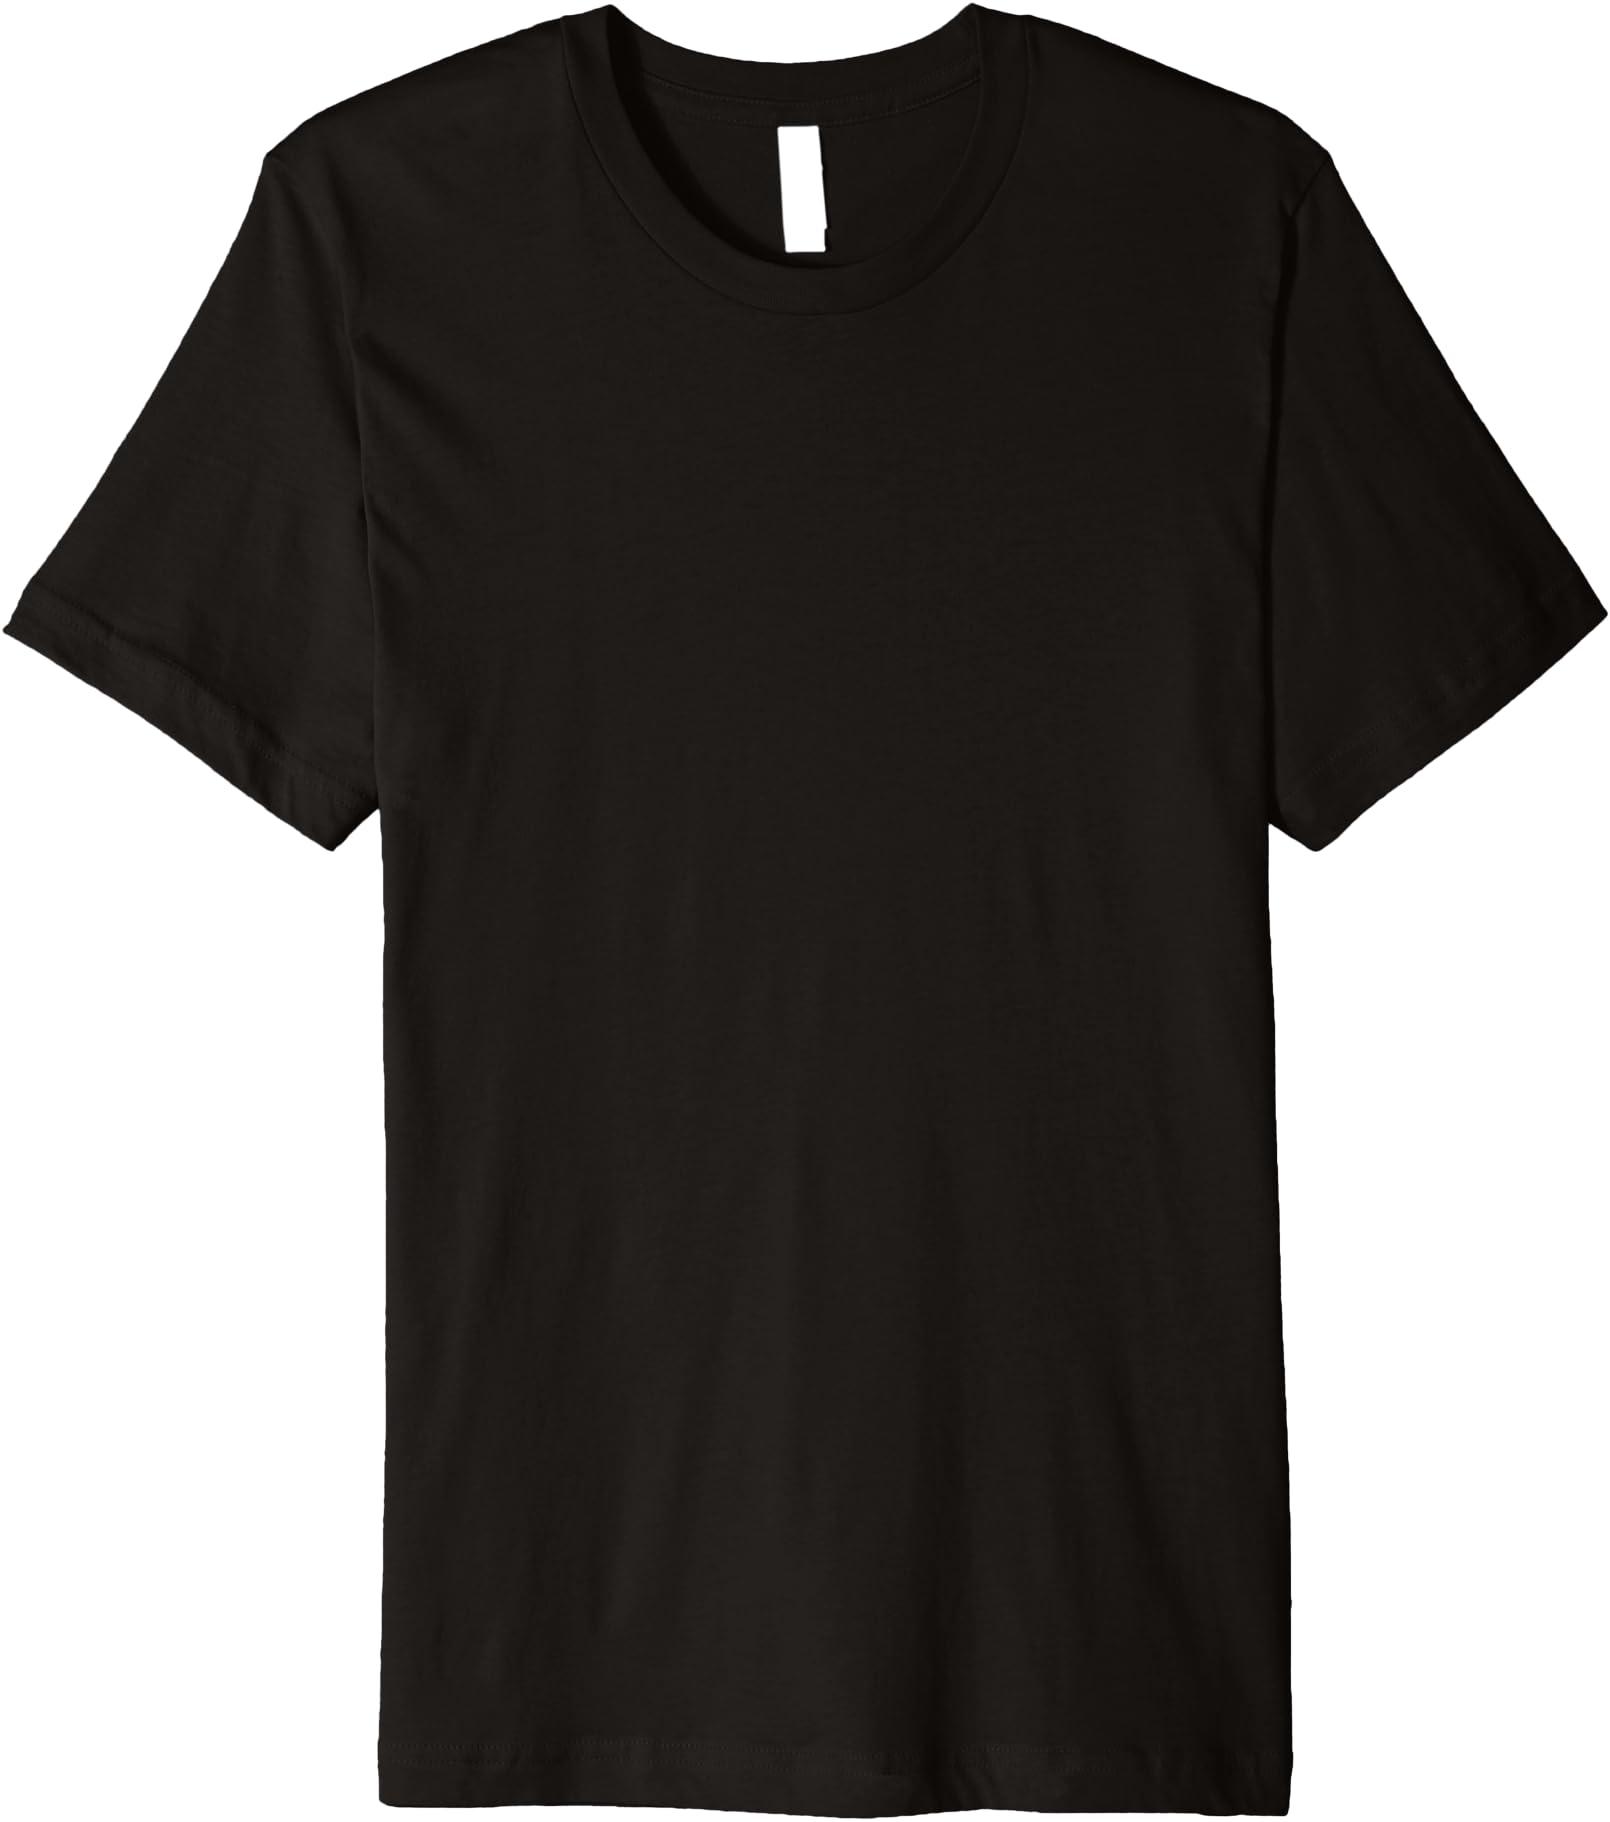 Tie Dye Dog Paw Short Sleeves Shirt Girls Boy